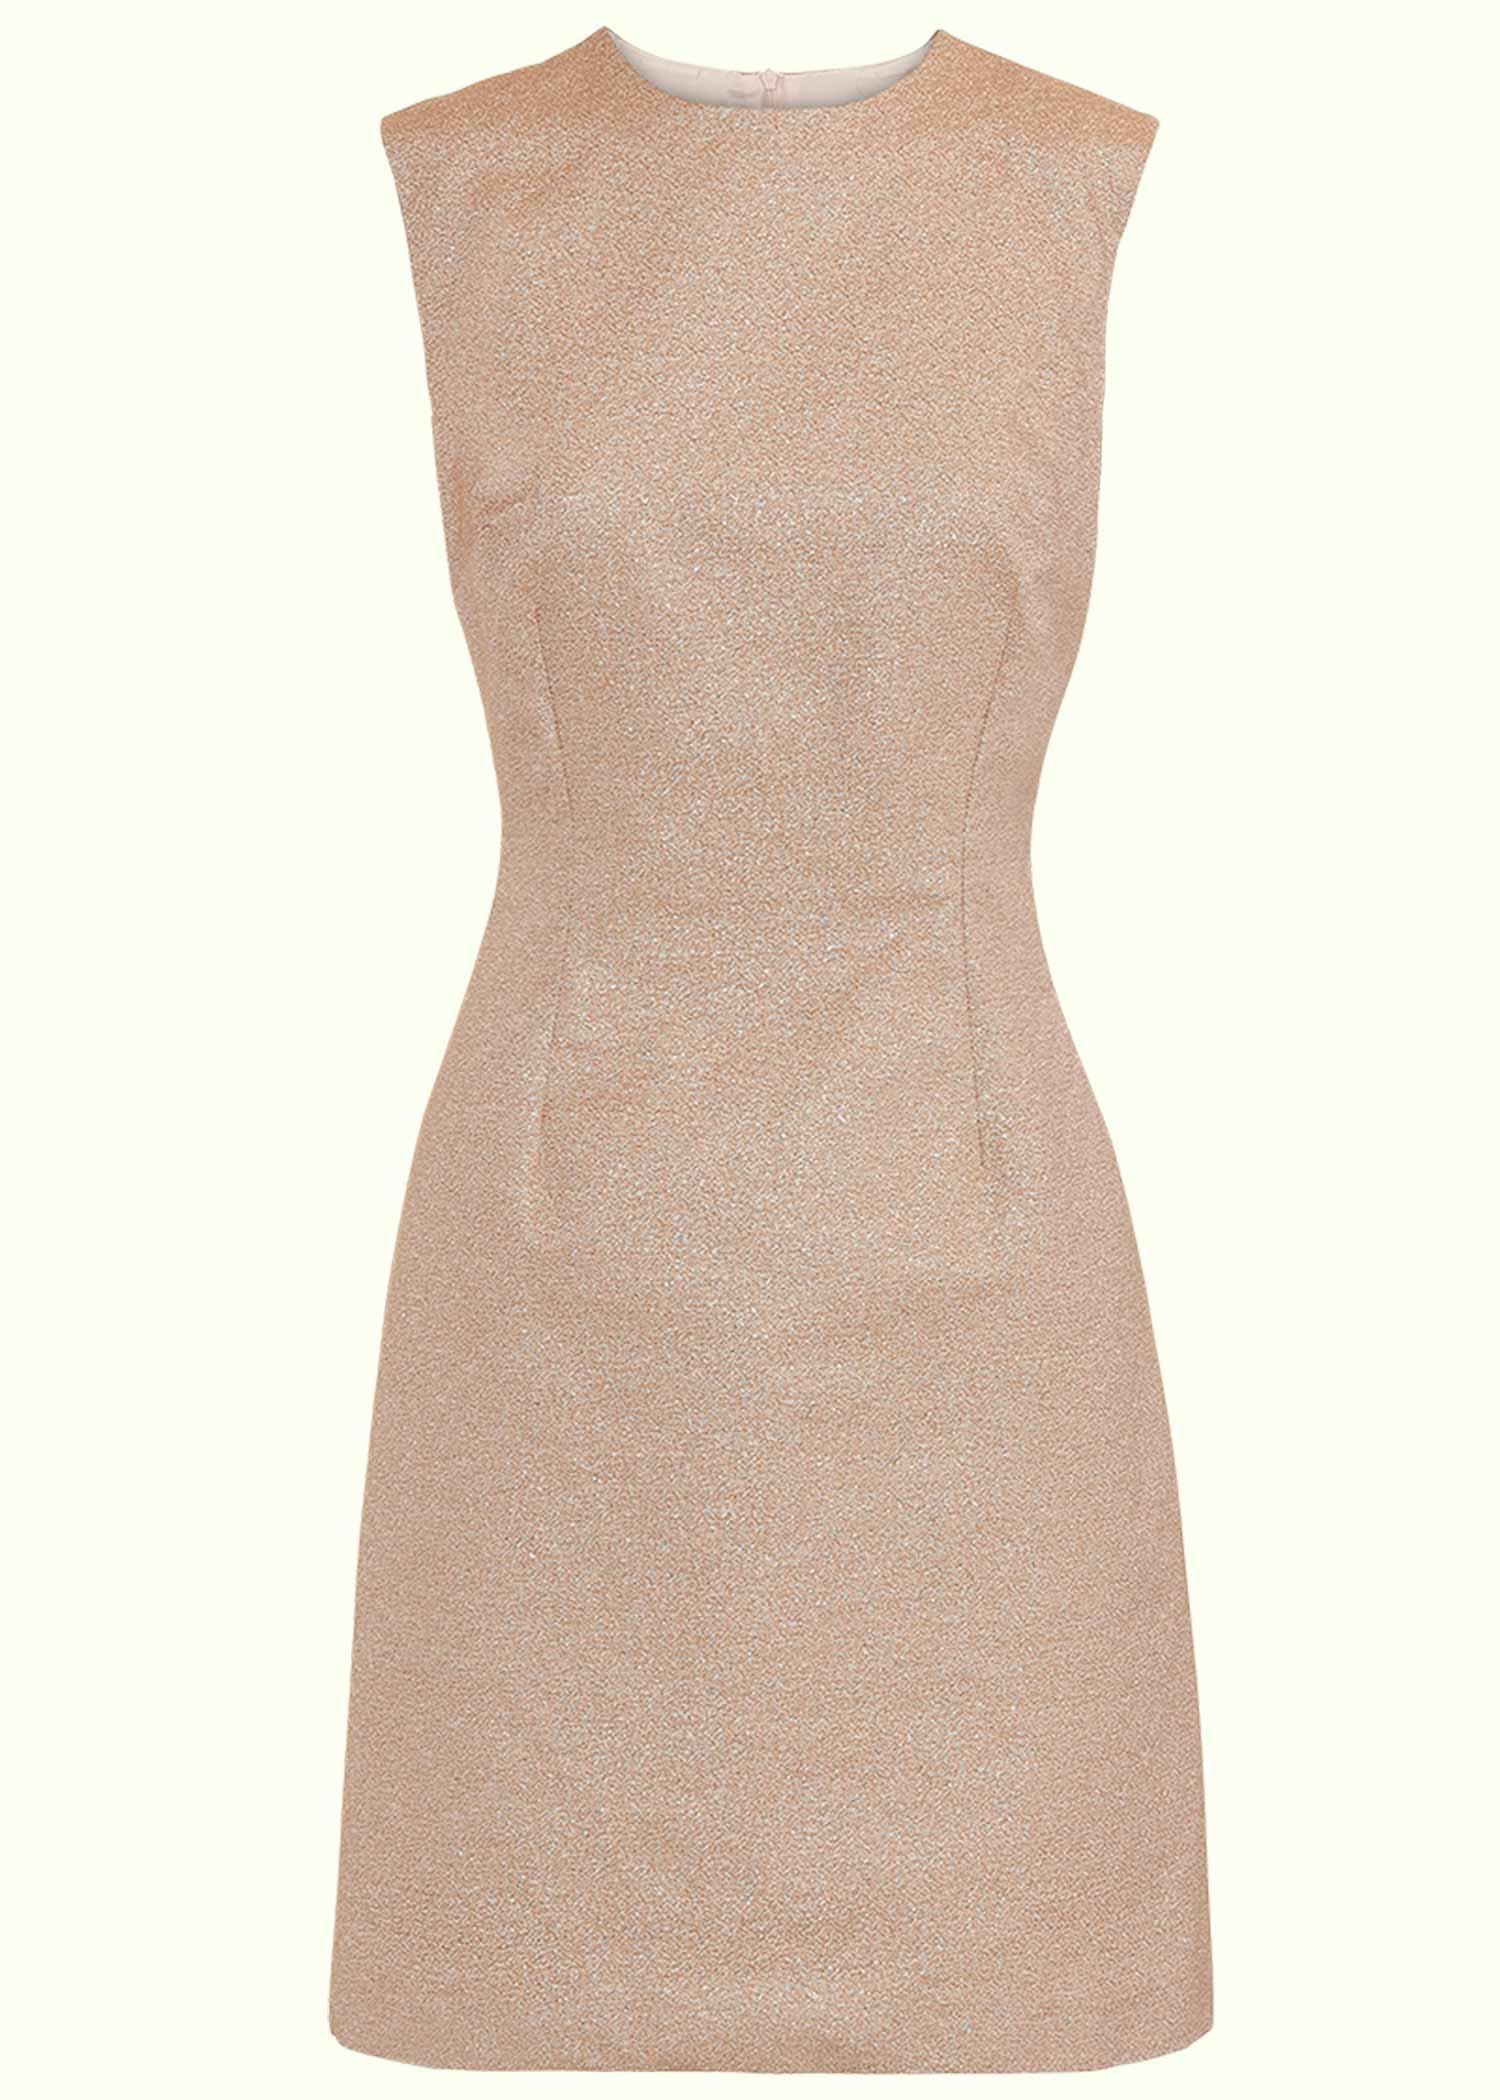 60'er Mini kjole i guld glitter fra Marmalade